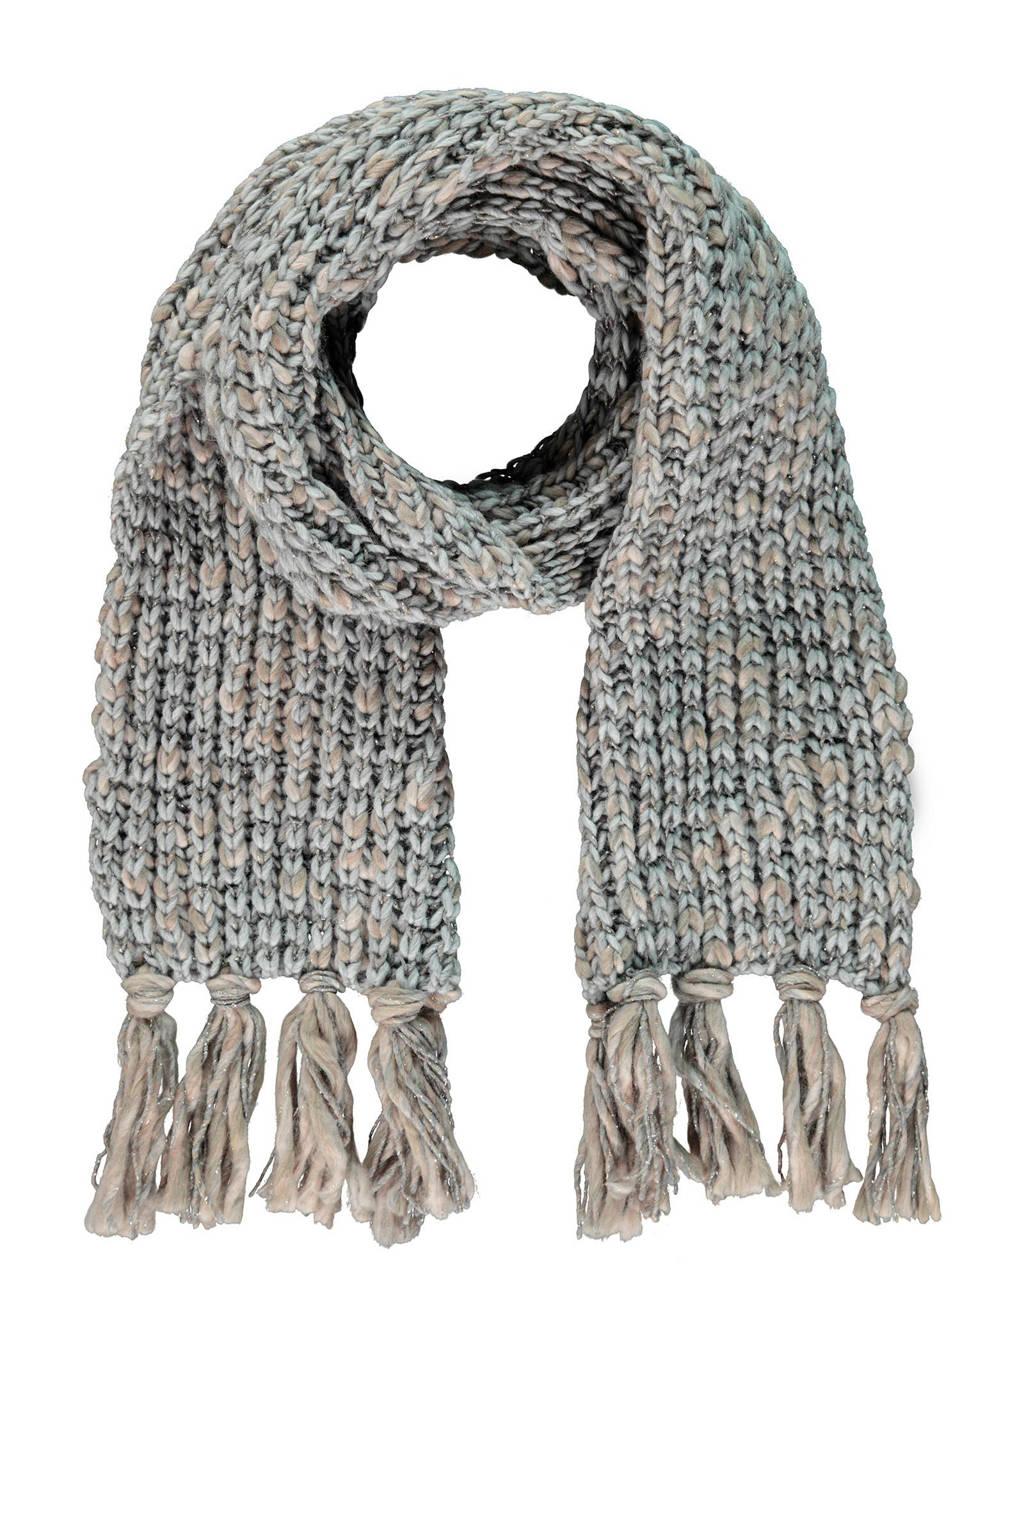 Claudia Sträter sjaal grijs, medium grey